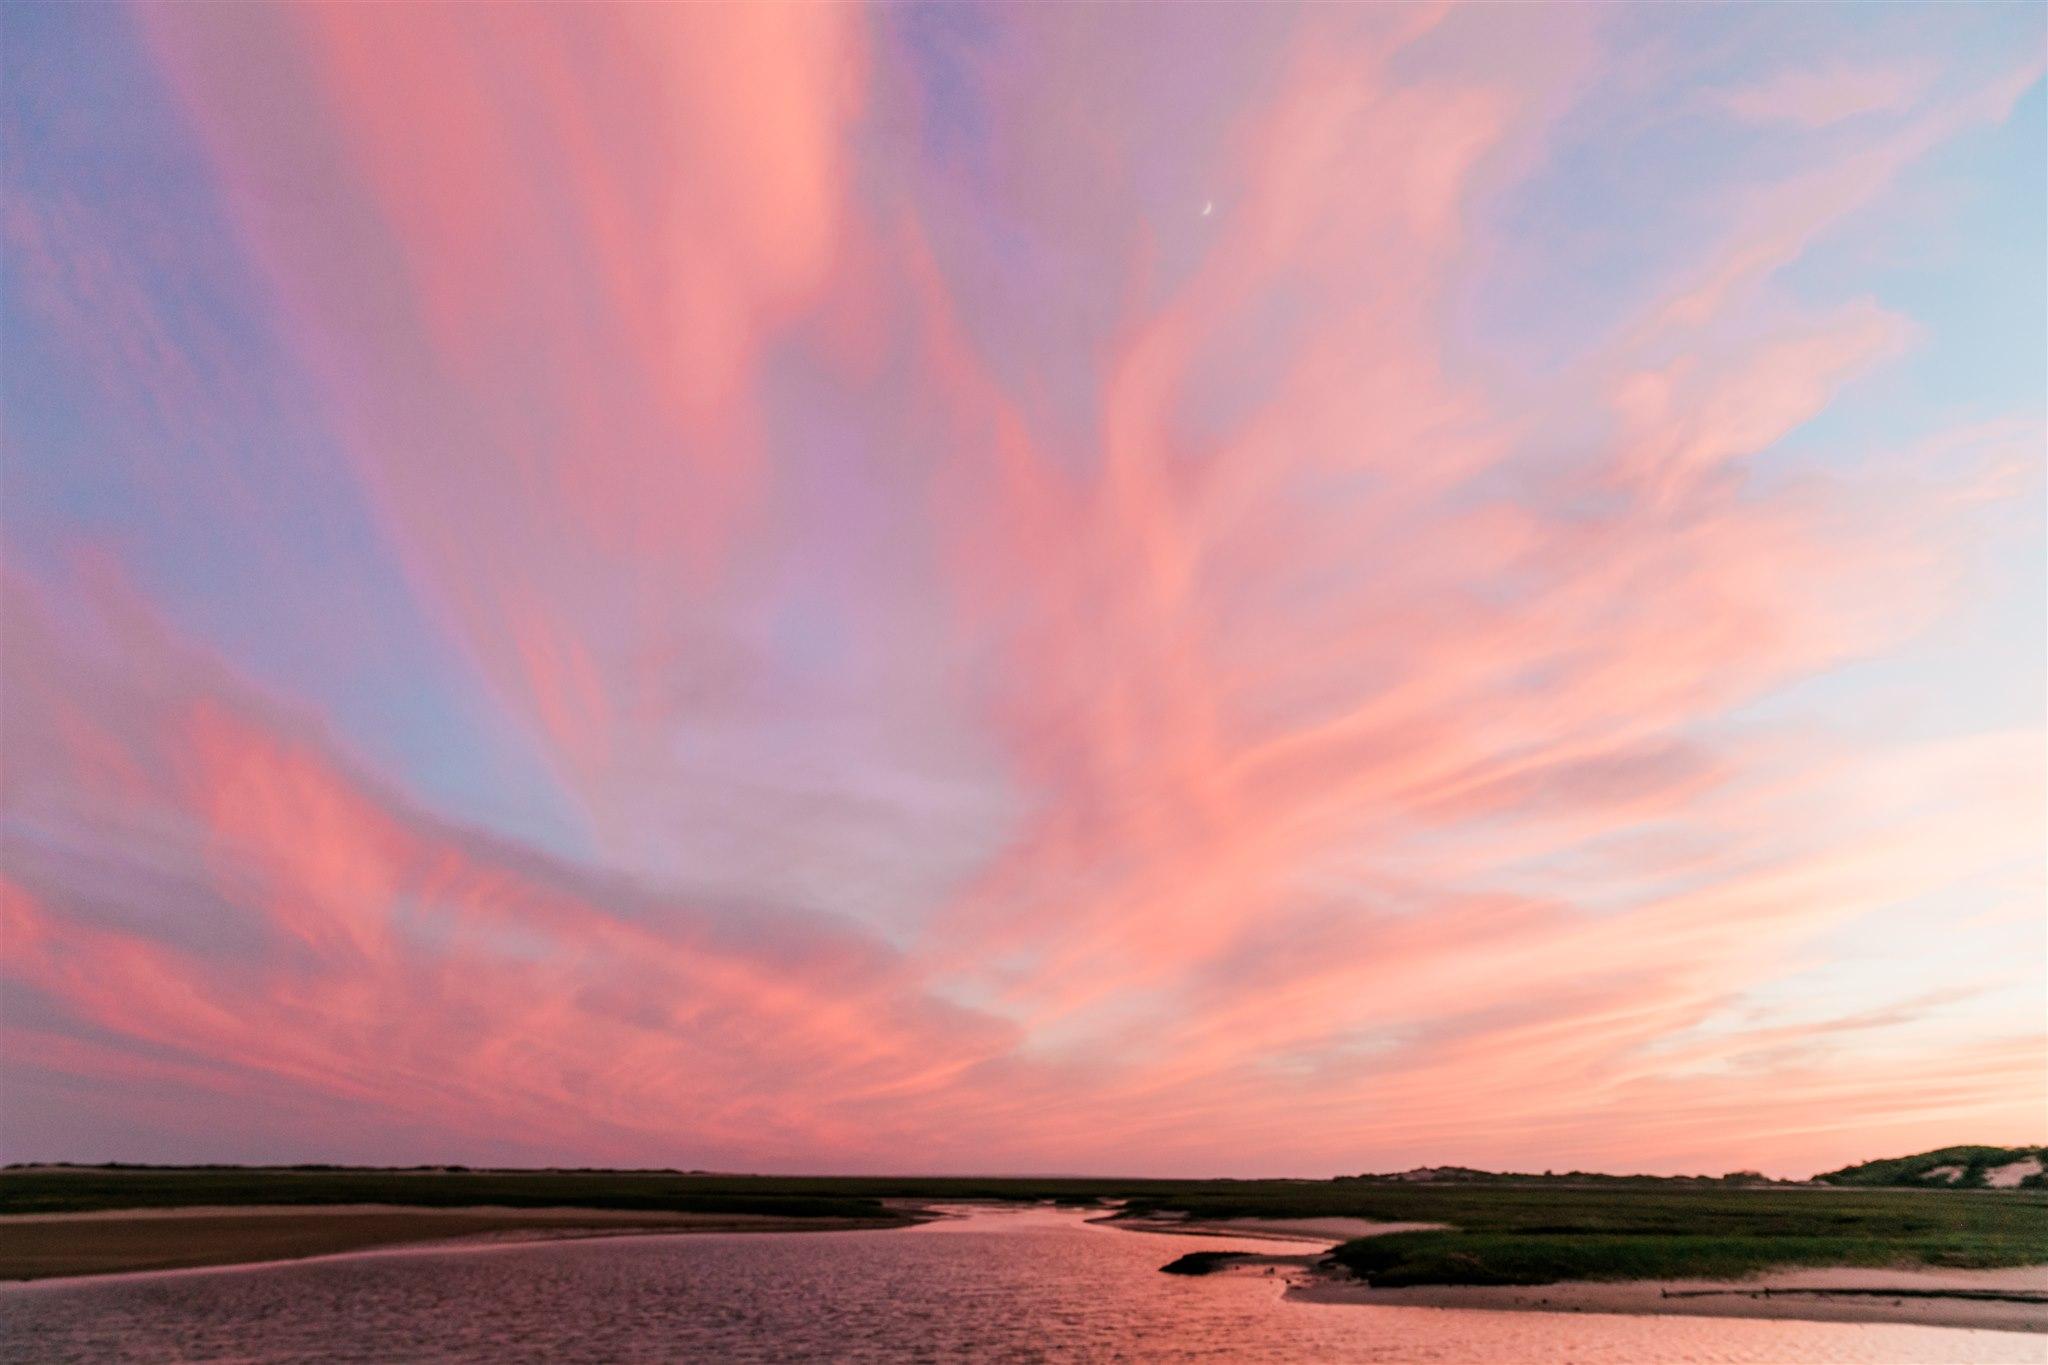 Sunset in Ptown Cape Cod